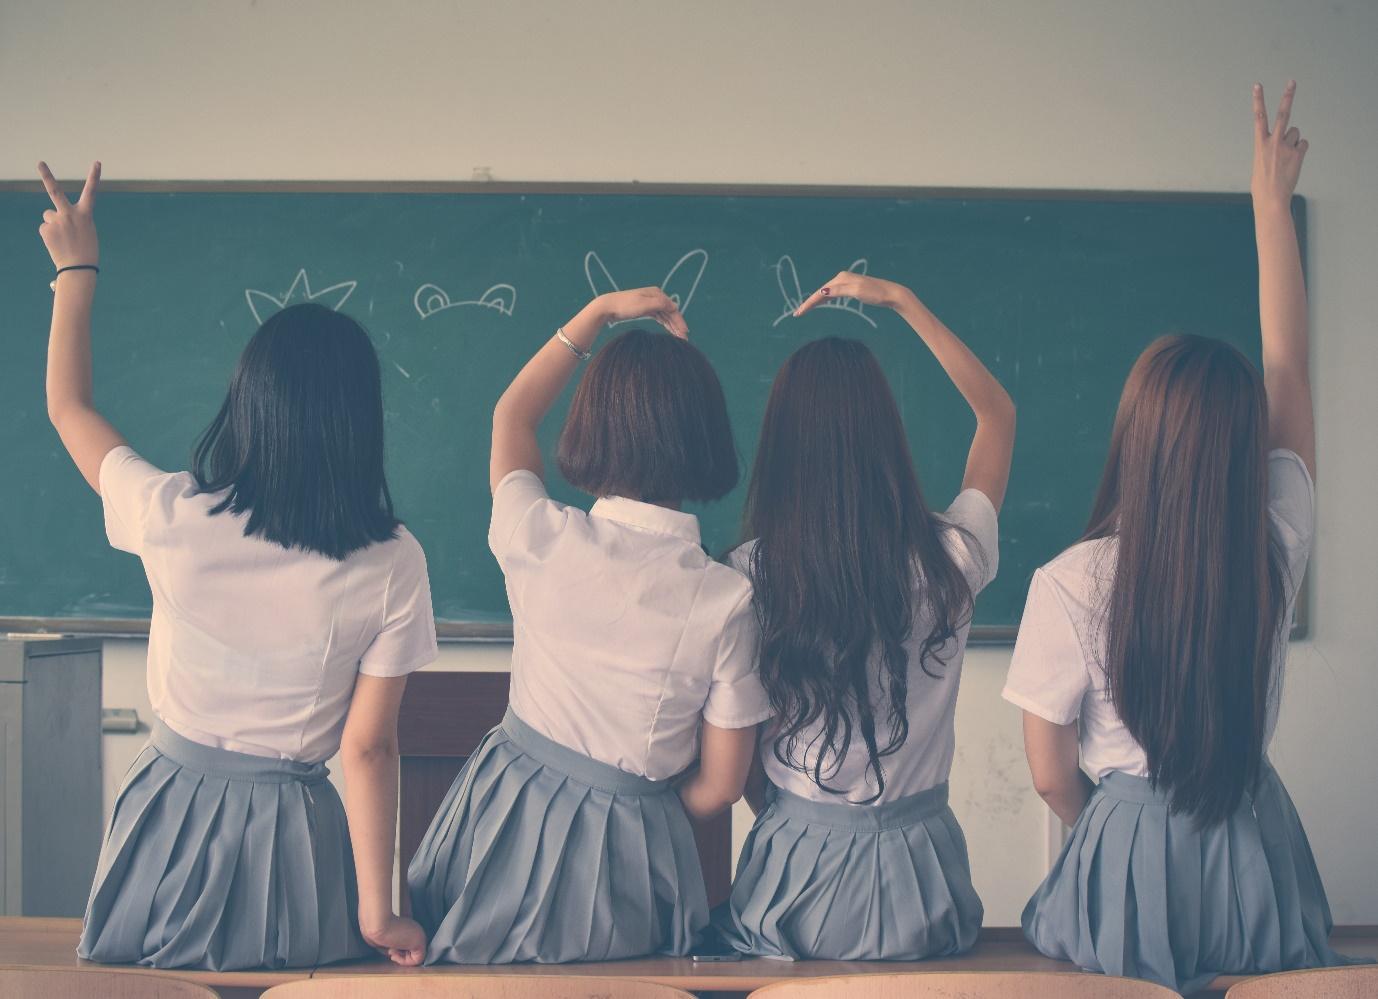 Does Wearing A Uniform Instil Discipline for Children in Private School?